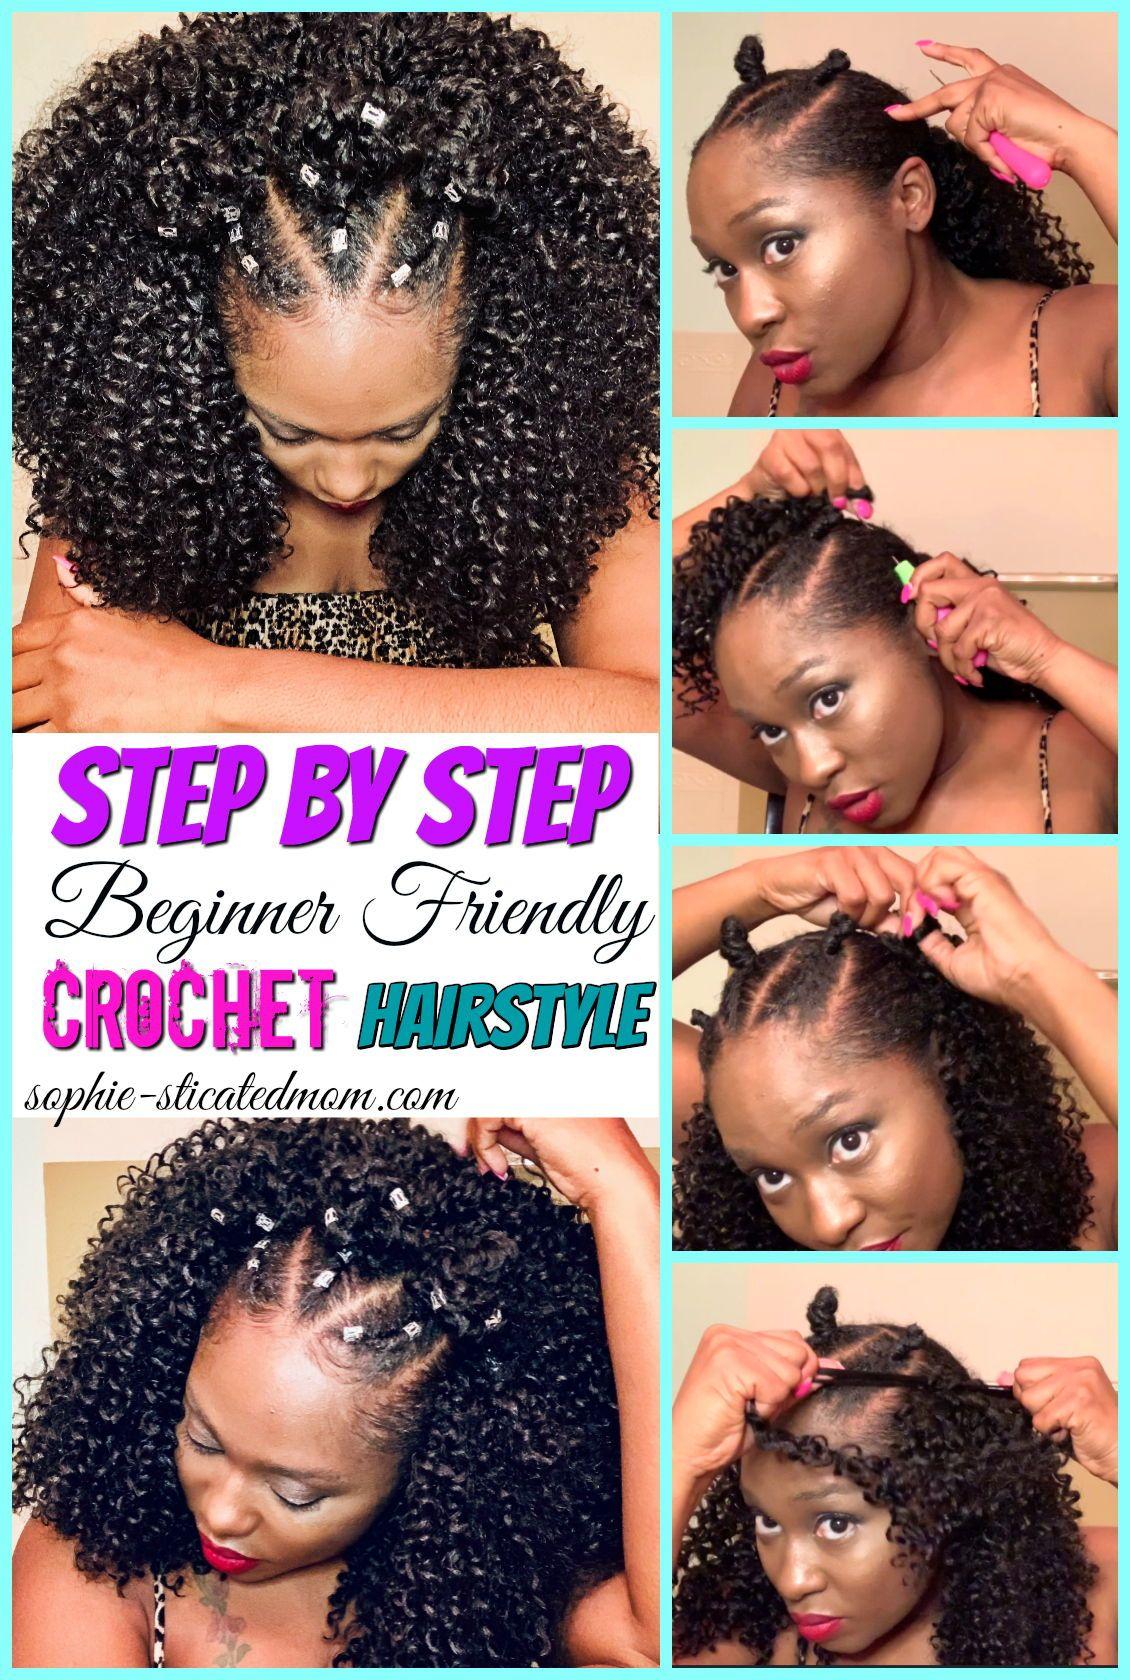 Step By Step Easy Beginner Friendly Braidless Crochet Hairstyles For Beginners Using Sensational Braidless Crochet Crochet Braids Hairstyles Curly Hair Styles